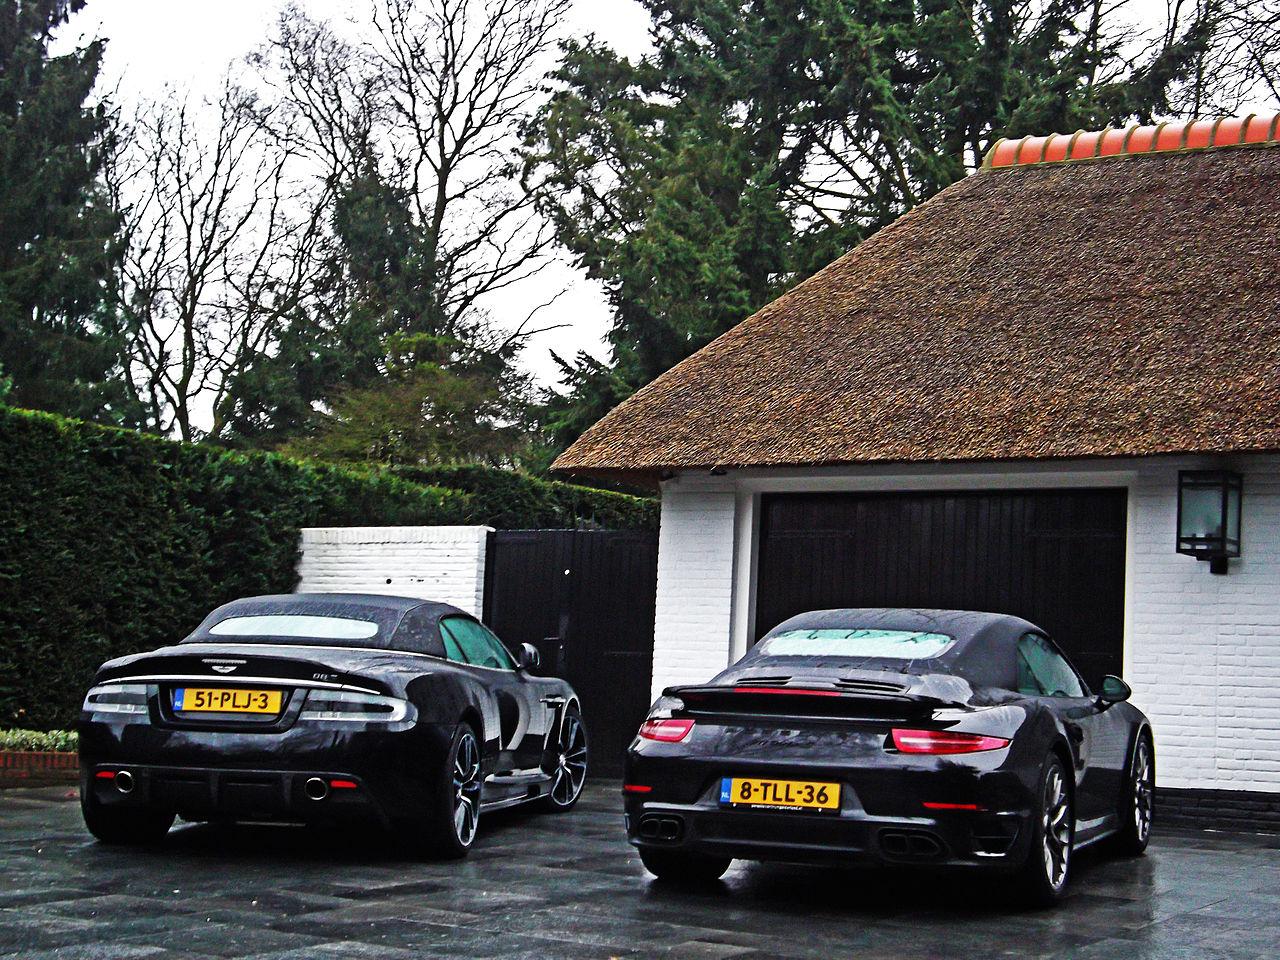 File Aston Martin Dbs Volante Porsche 911 Turbo S 16201608207 Jpg Wikimedia Commons